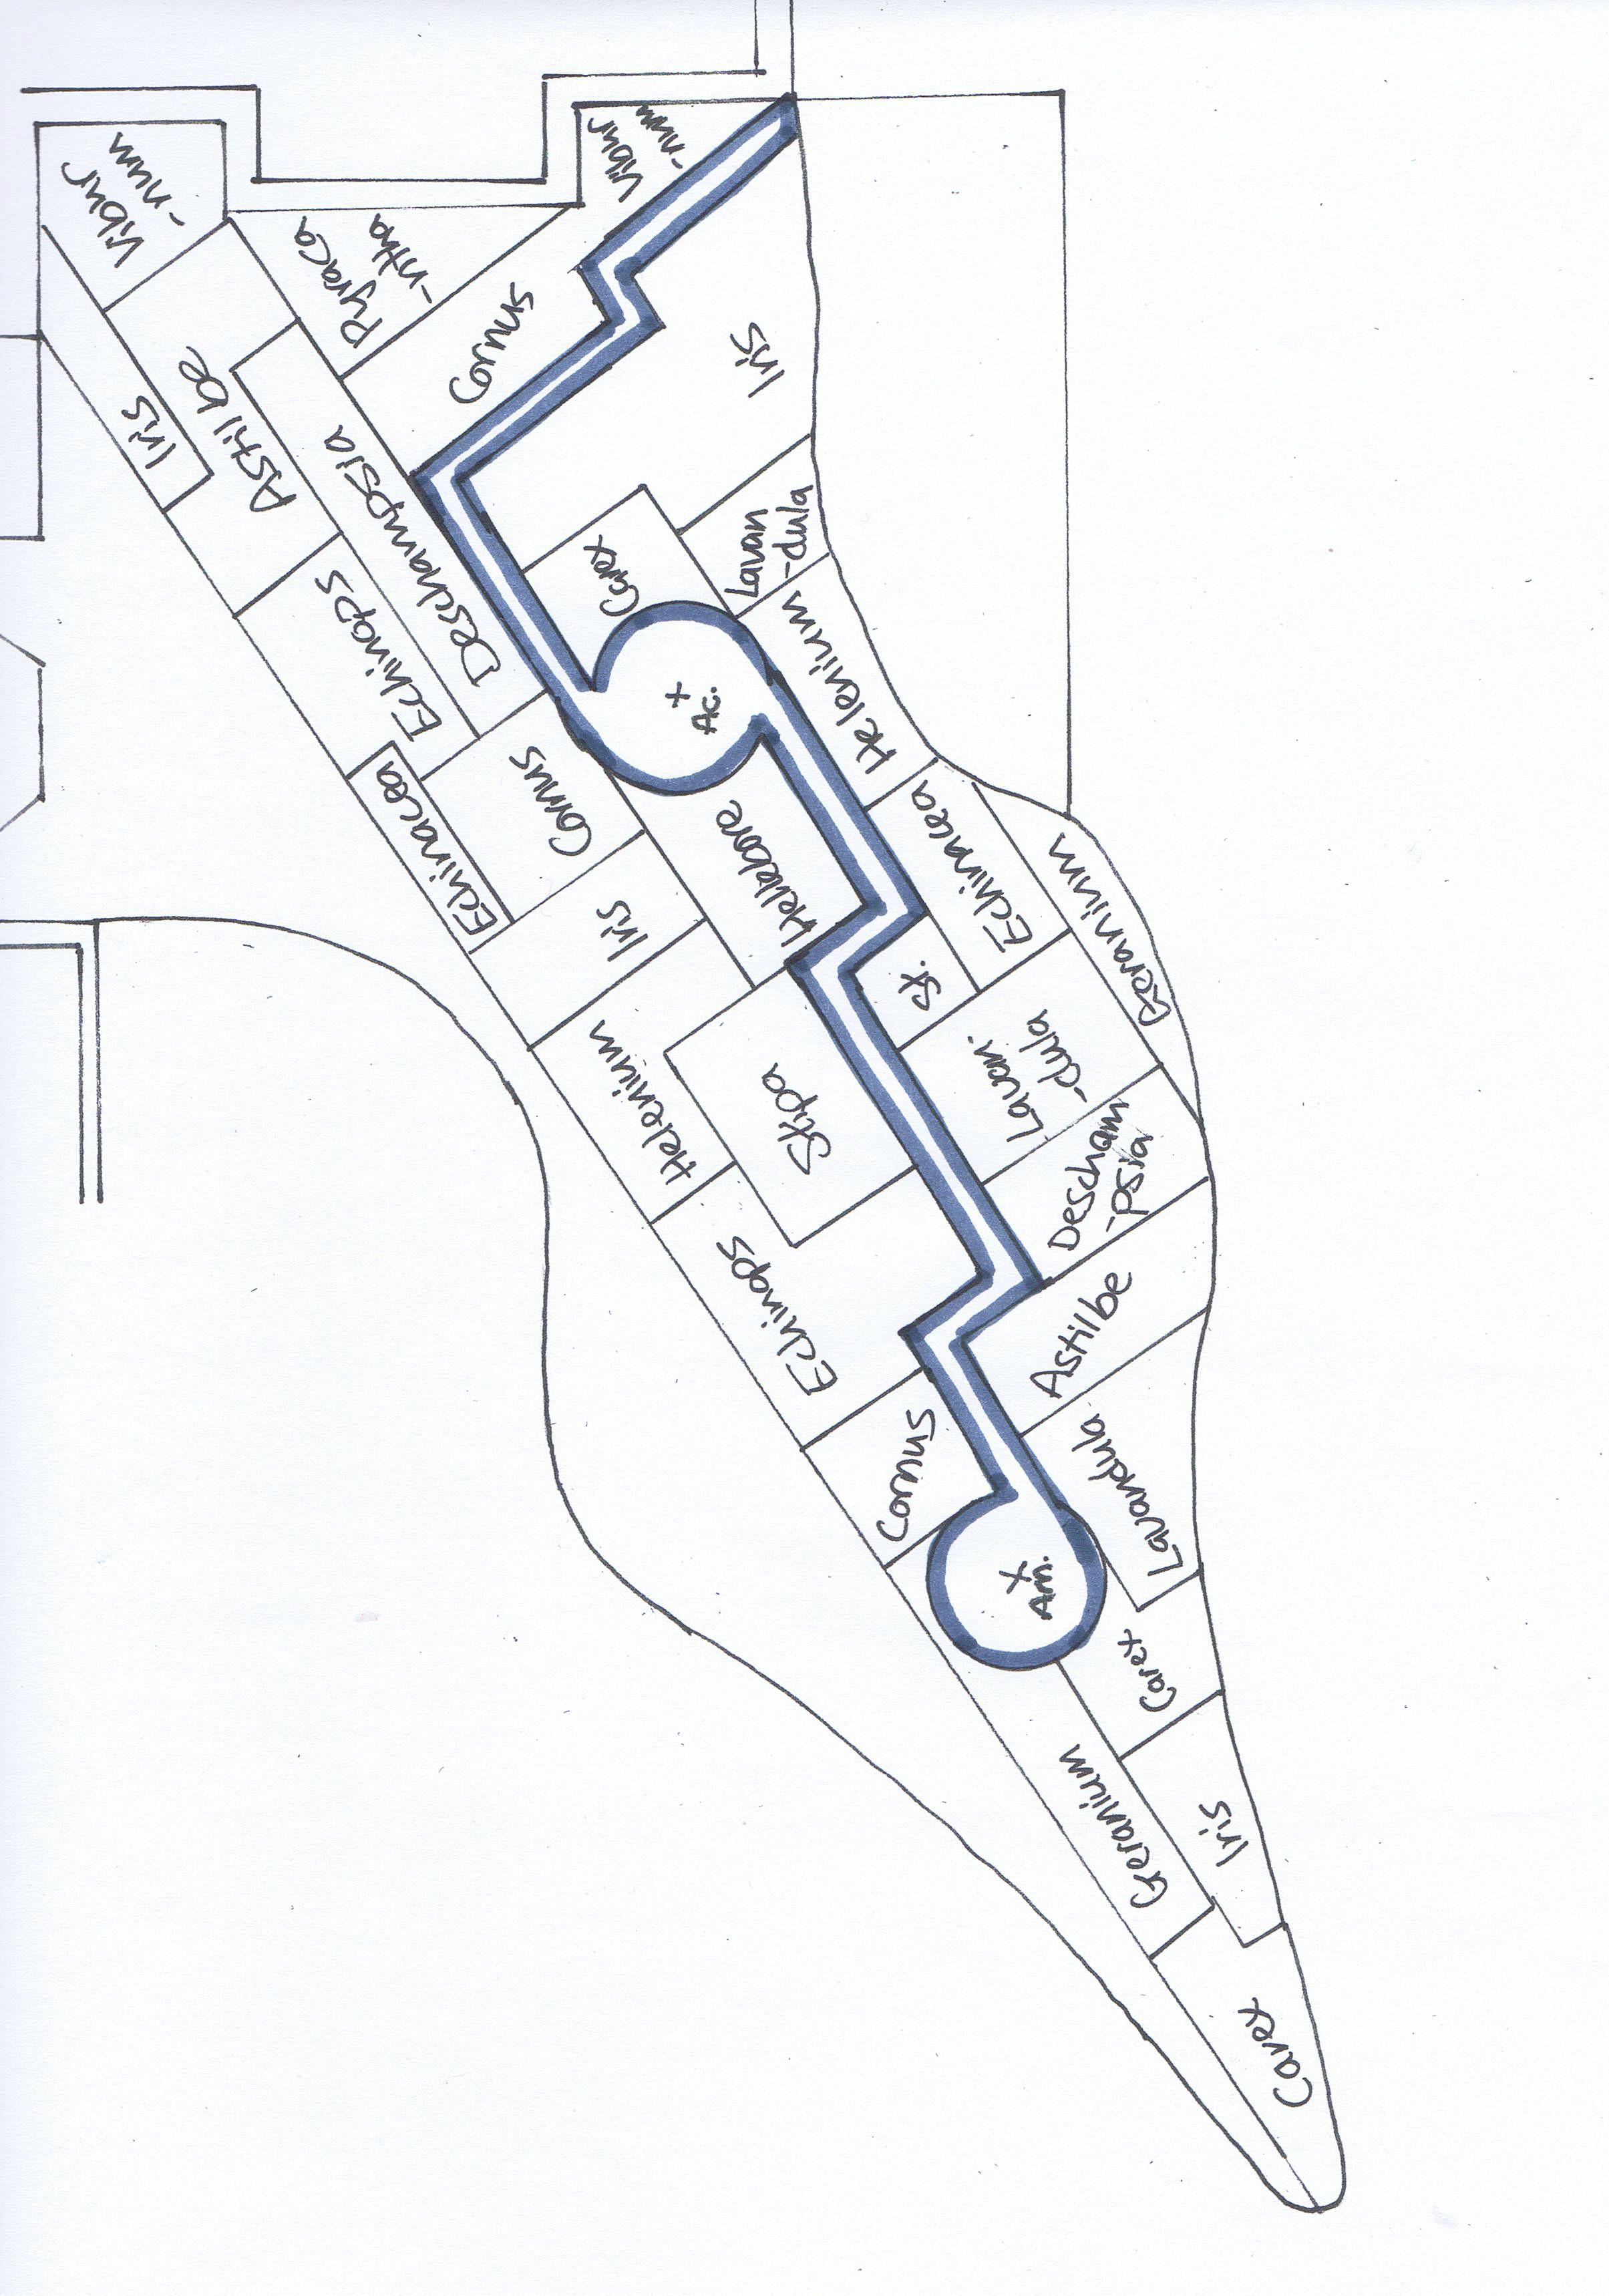 Border design plan with block planting adel front garden border